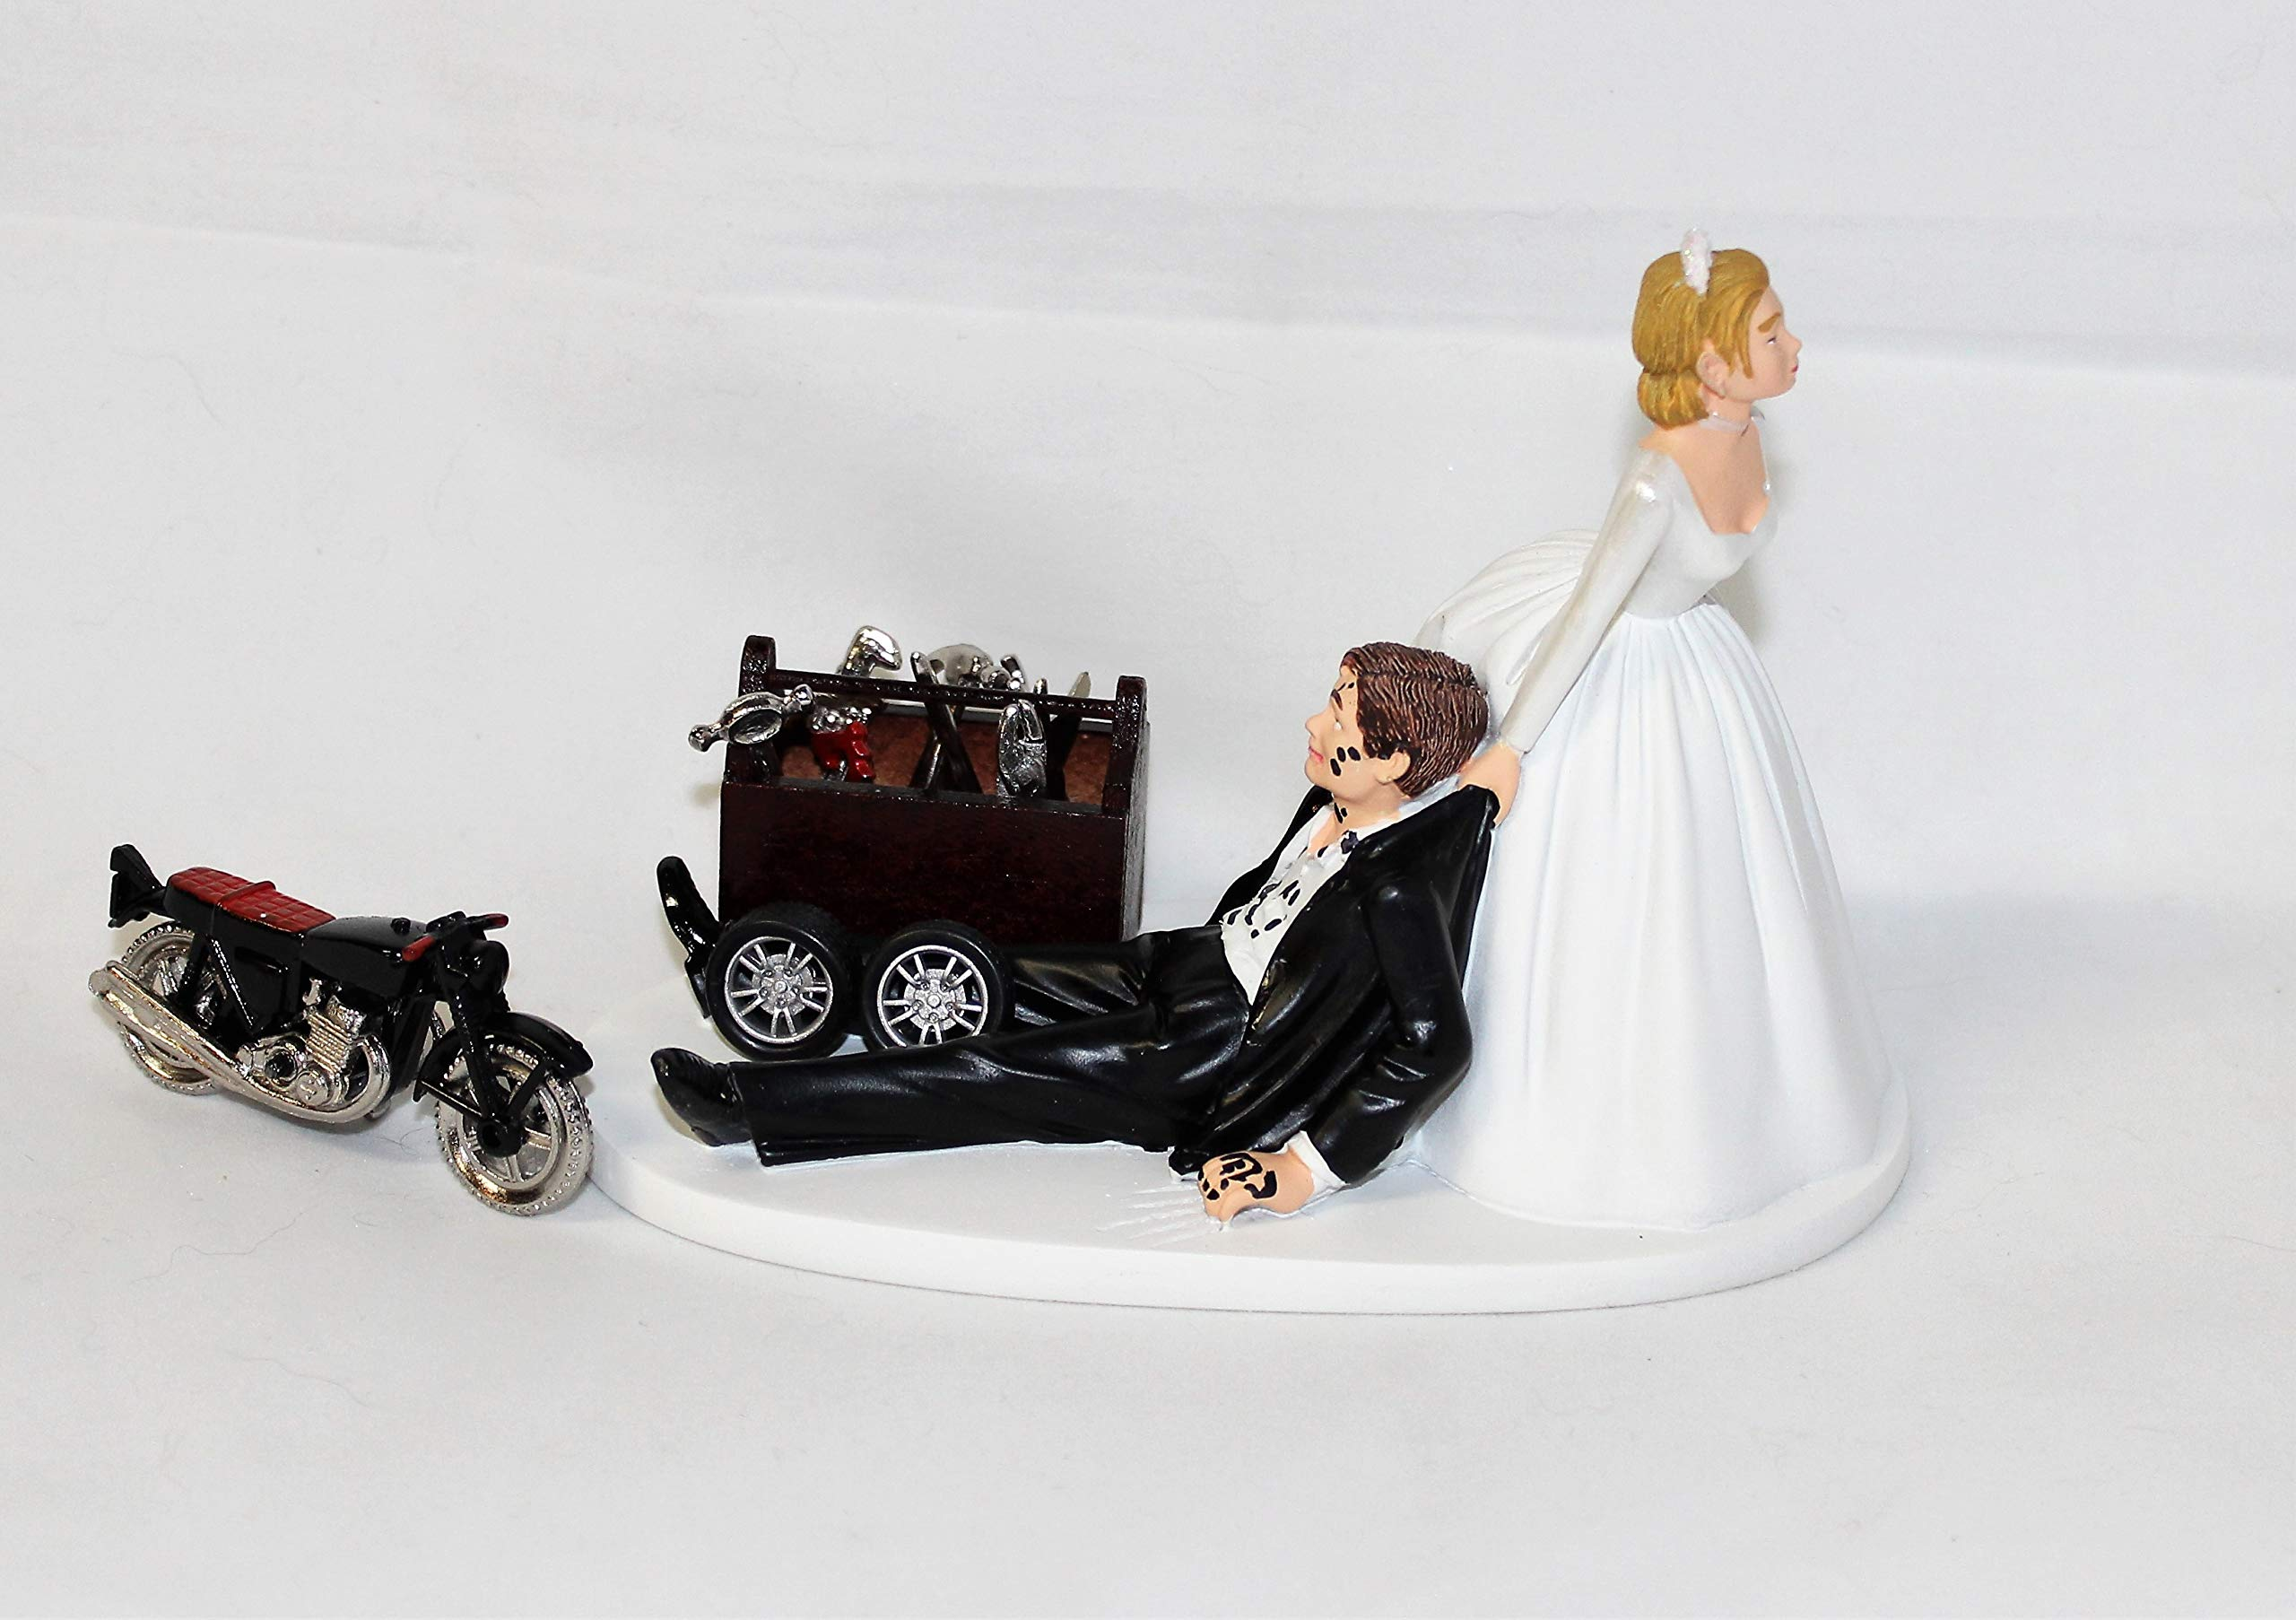 Wedding Motorcycle Biker Garage Mechanic grease Cake Topper by Custom Design Wedding Supplies by Suzanne (Image #1)